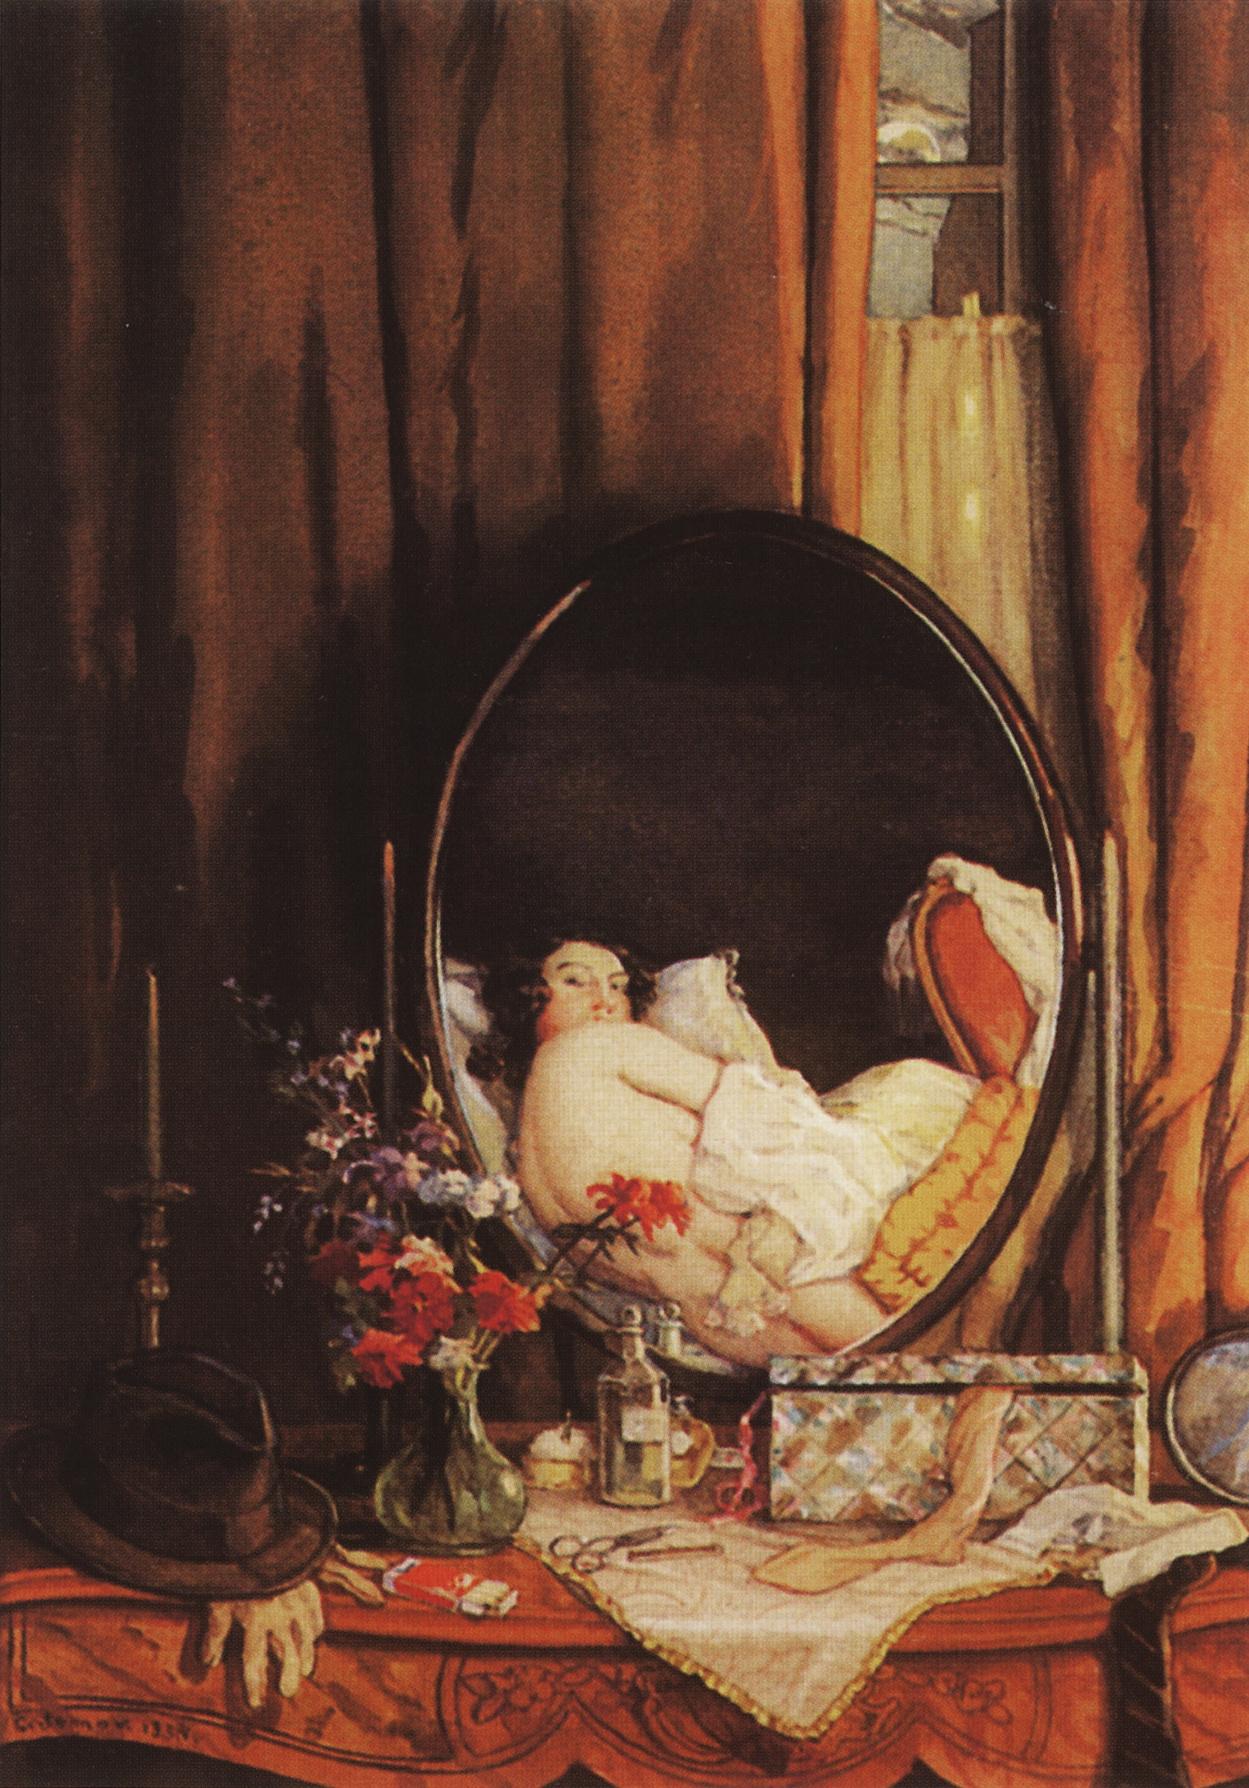 Constantin Somov. Intimate reflection in the vanity mirror